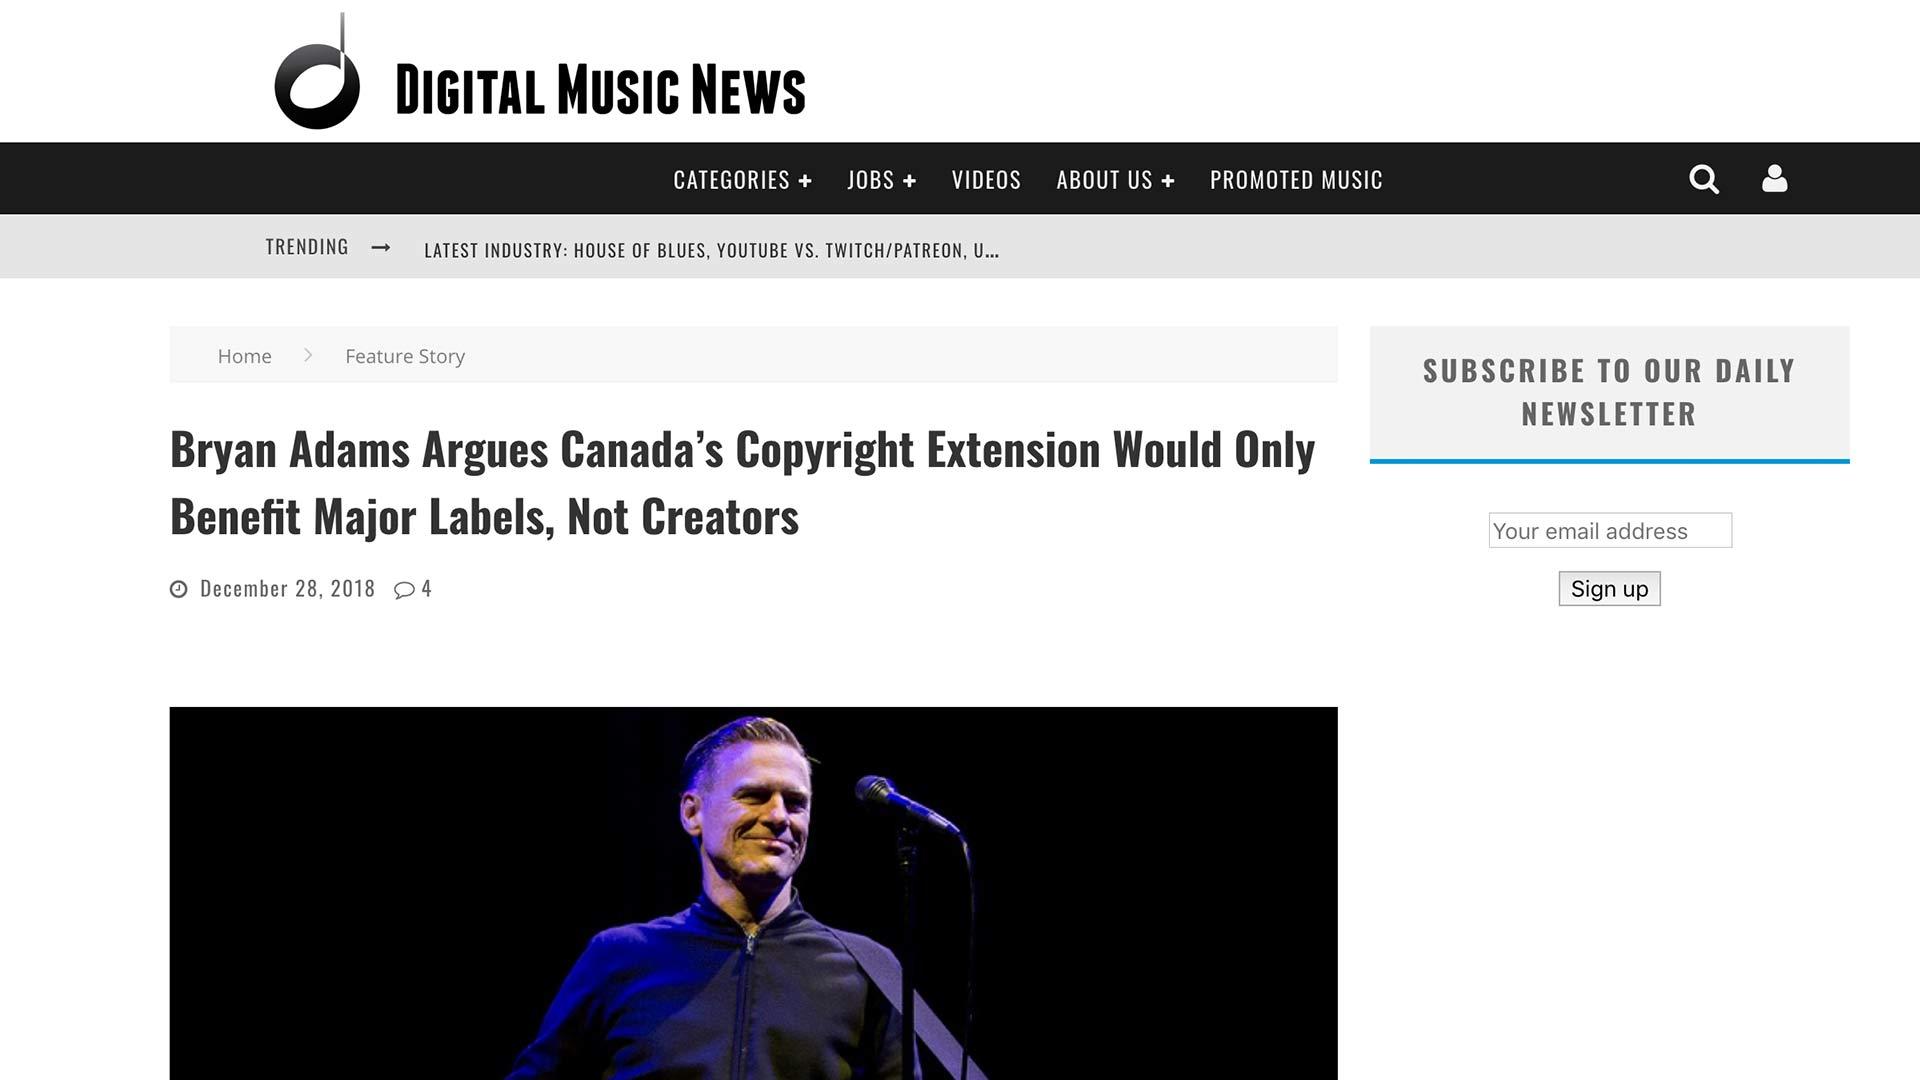 Fairness Rocks News Bryan Adams Argues Canada's Copyright Extension Would Only Benefit Major Labels, Not Creators